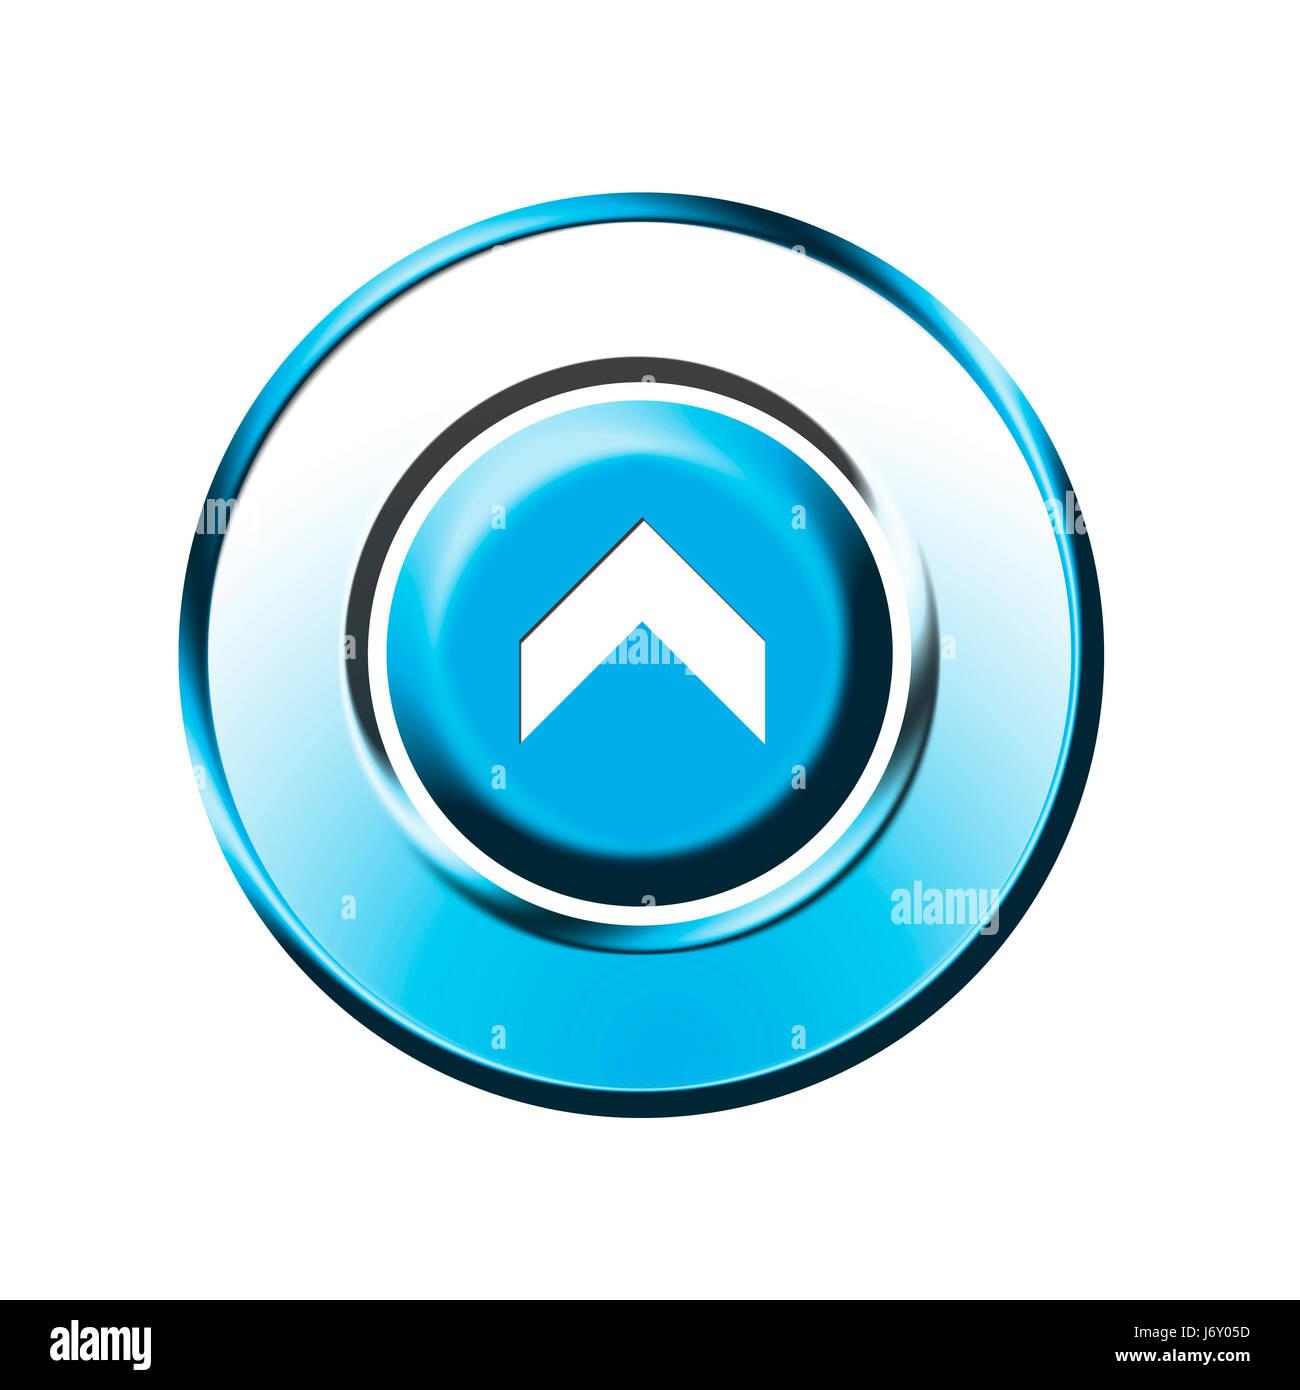 upwards upstairs direction button arrow isolated optional symbolic graphic Stock Photo